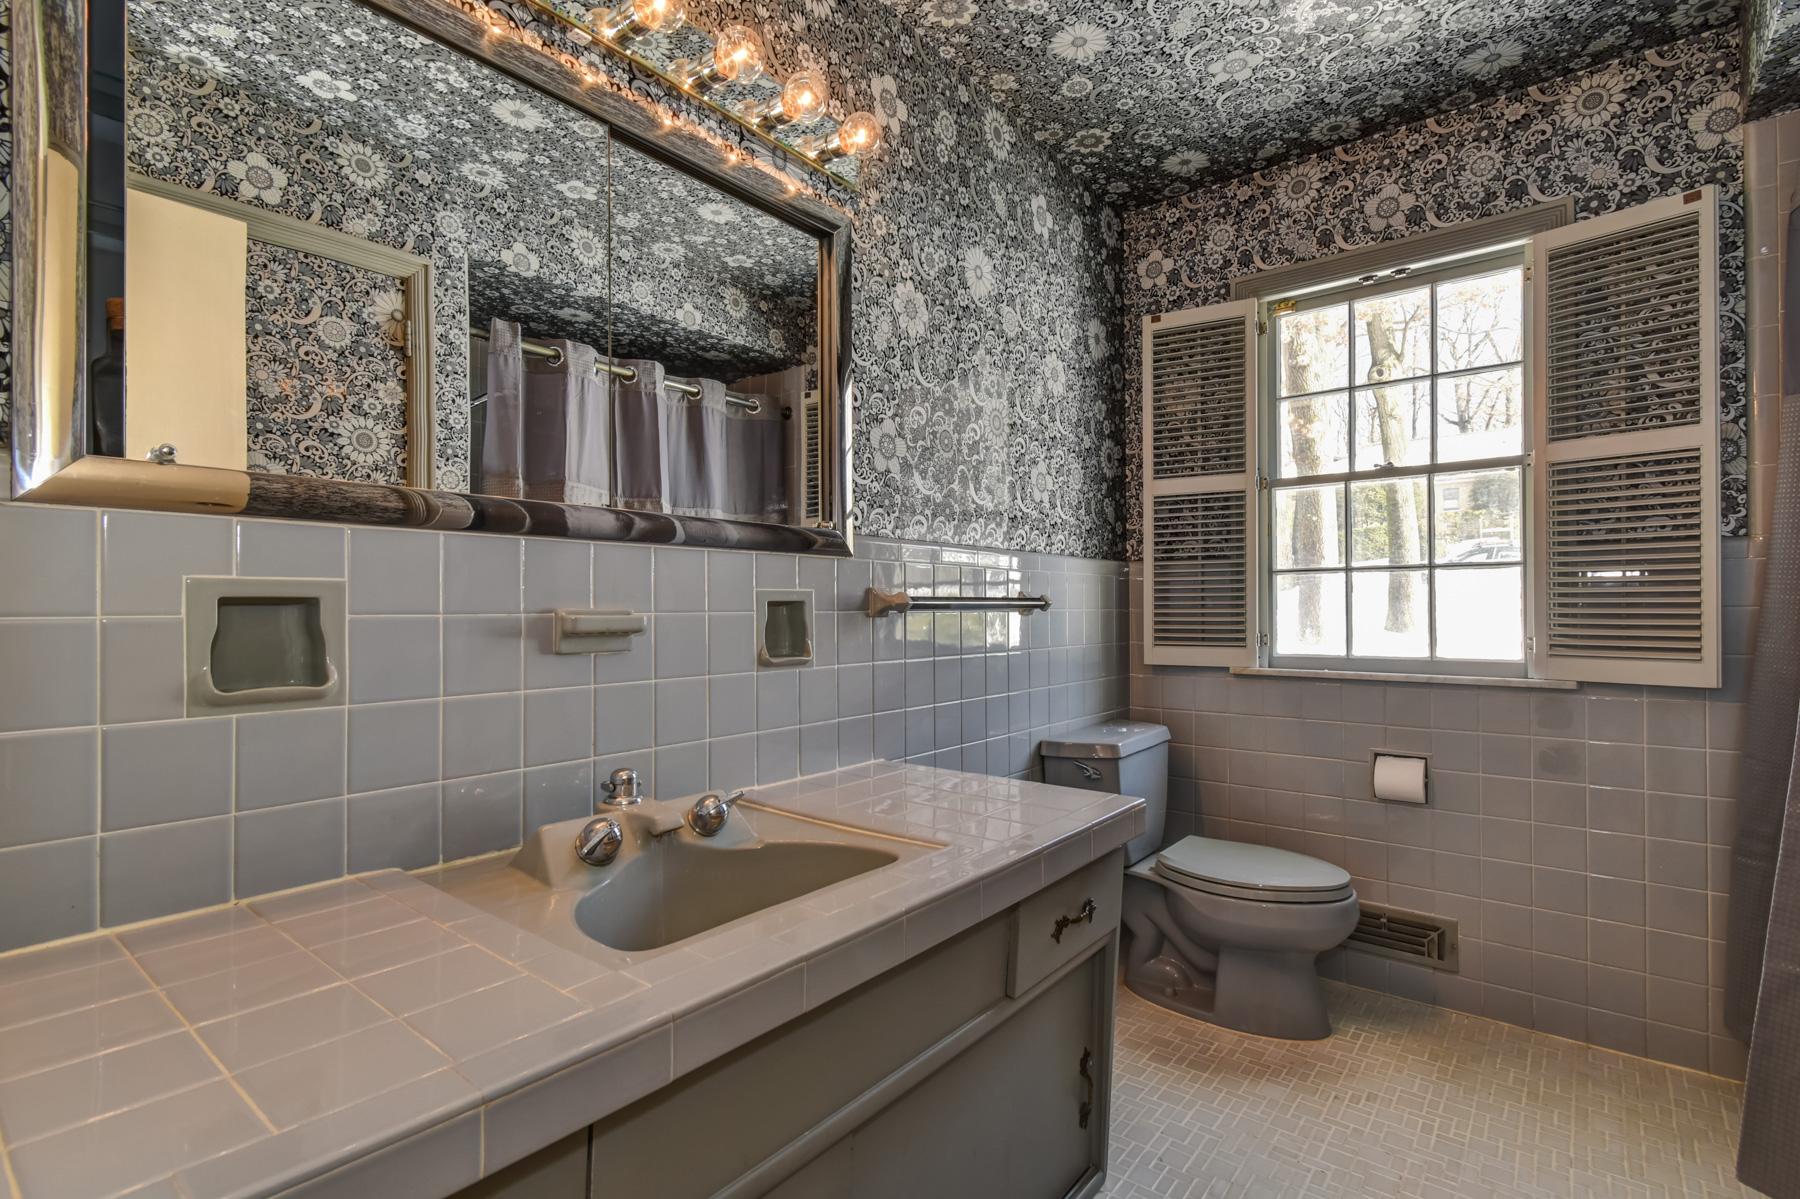 8. 12 Barry Lane Bathroom